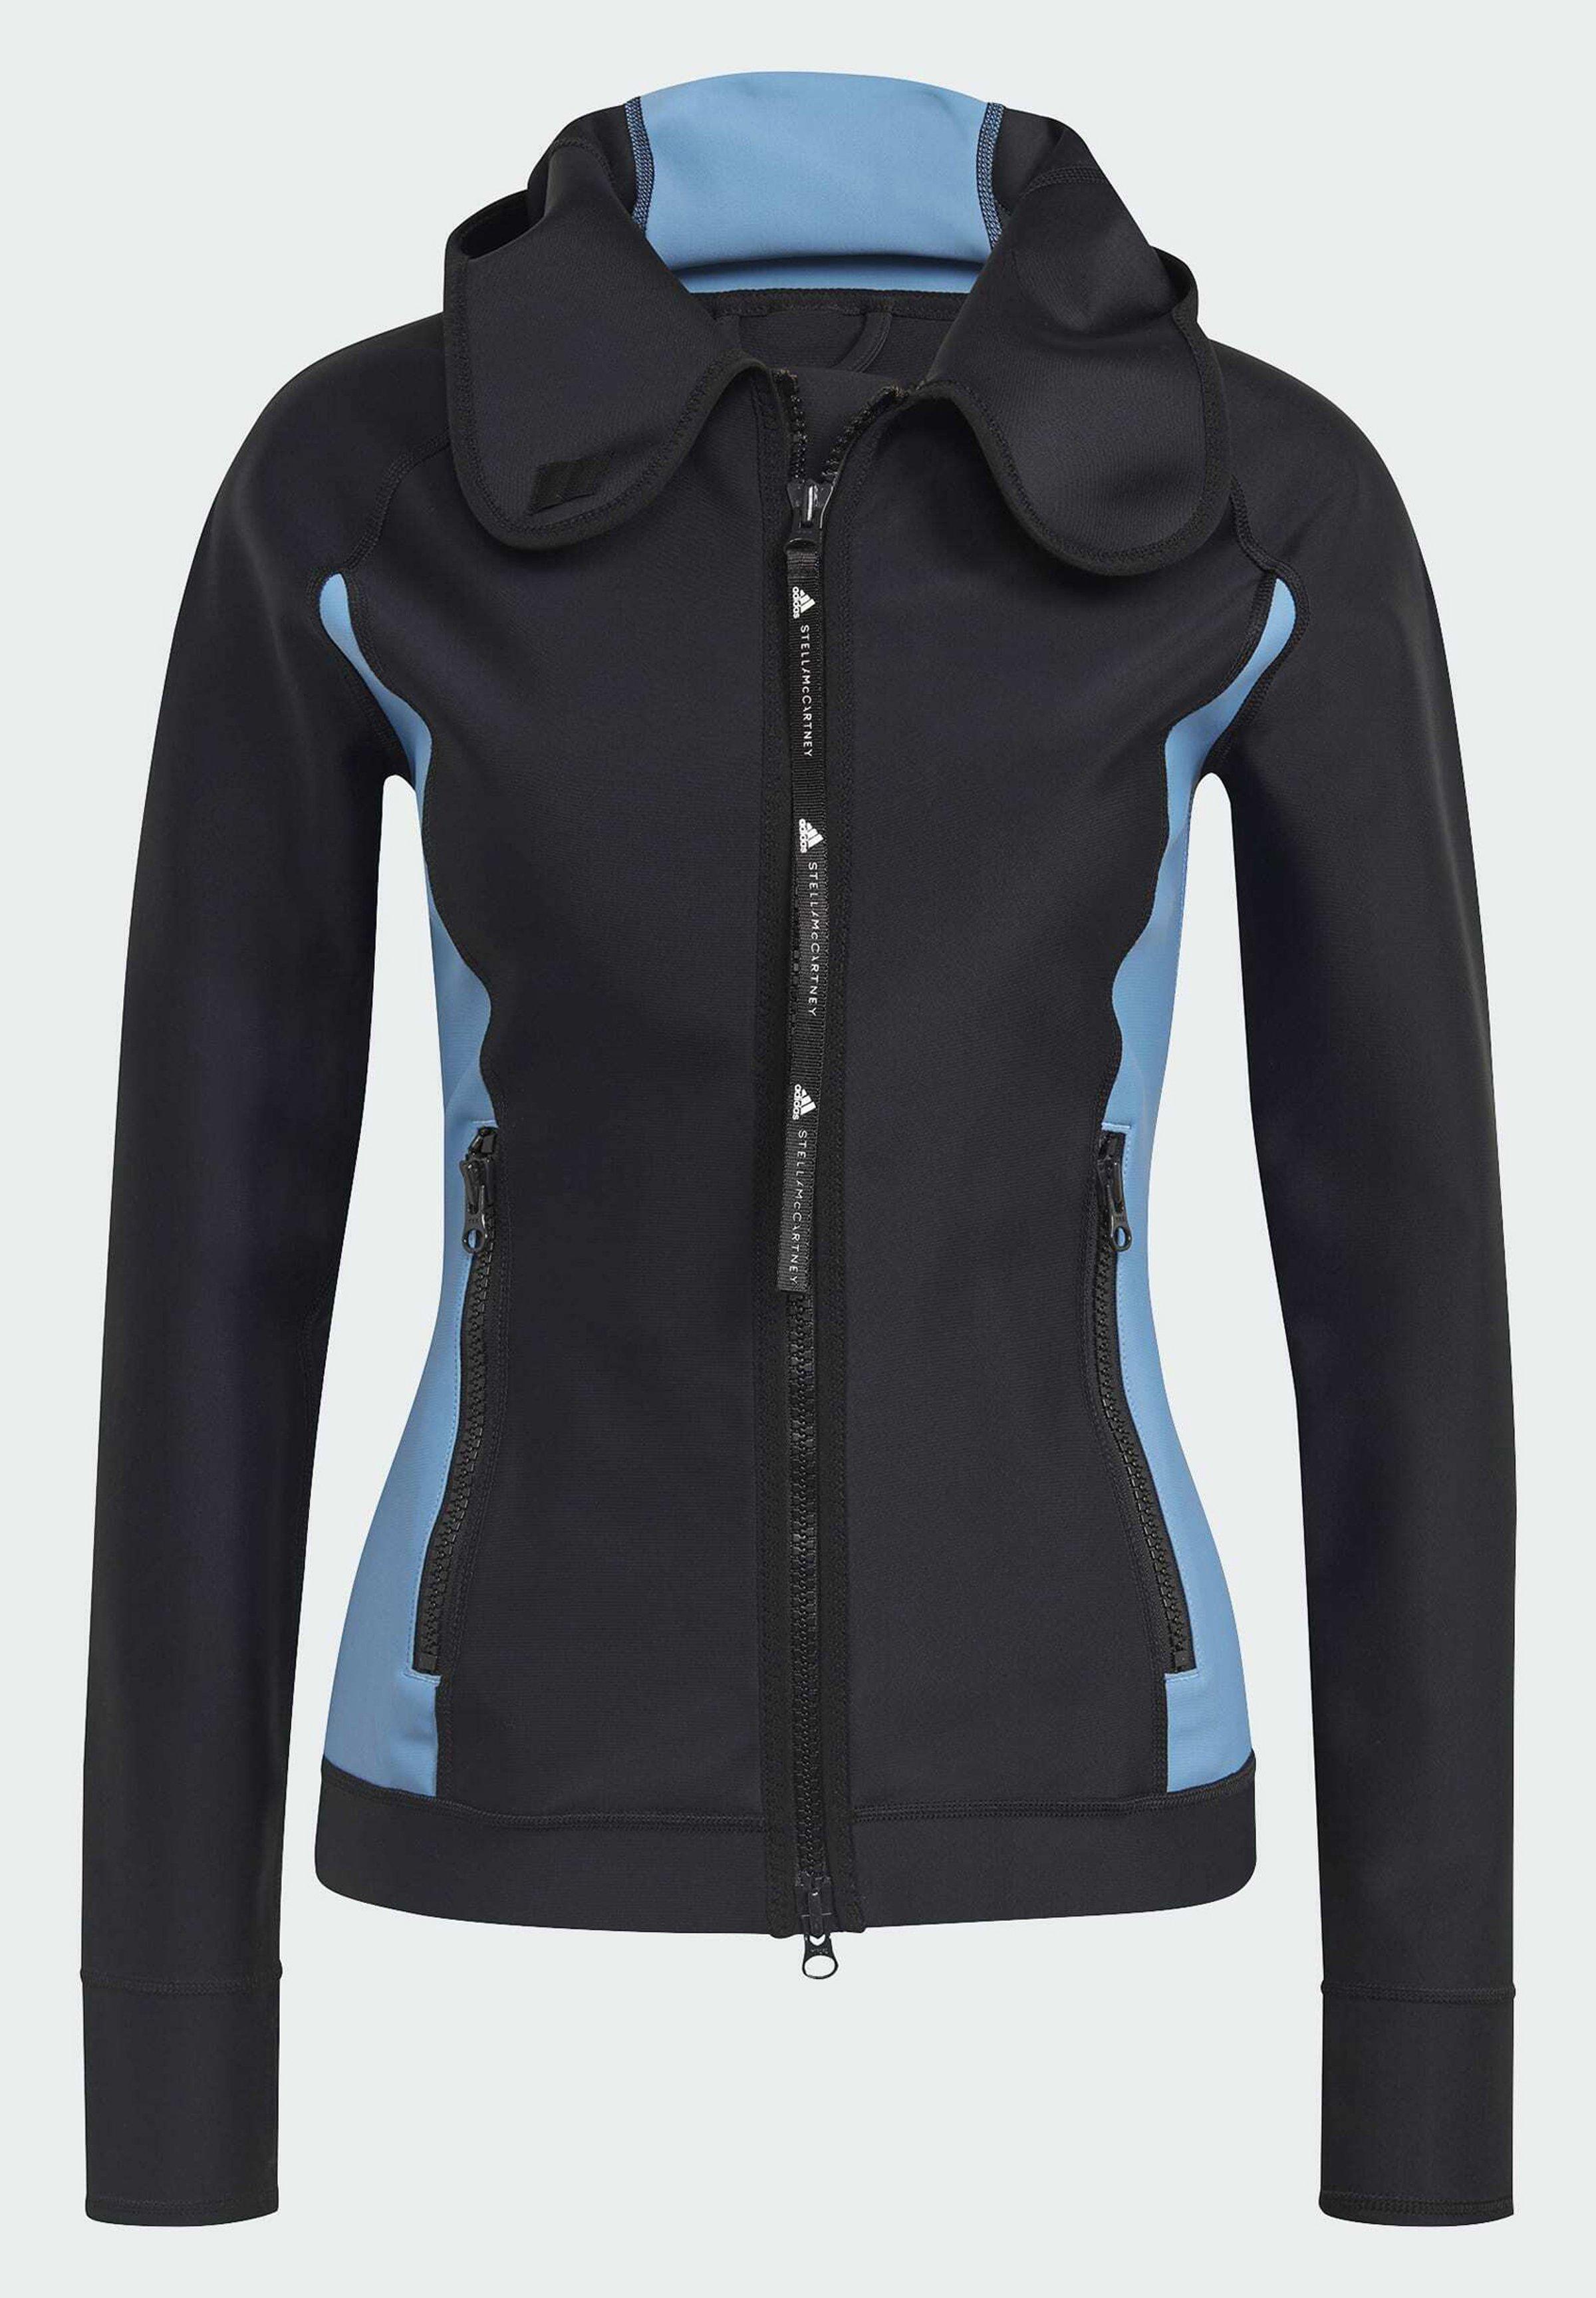 Women ADIDAS BY STELLA MCCARTNEY BEACHDEFENDER MIDLAYER JAC - Training jacket